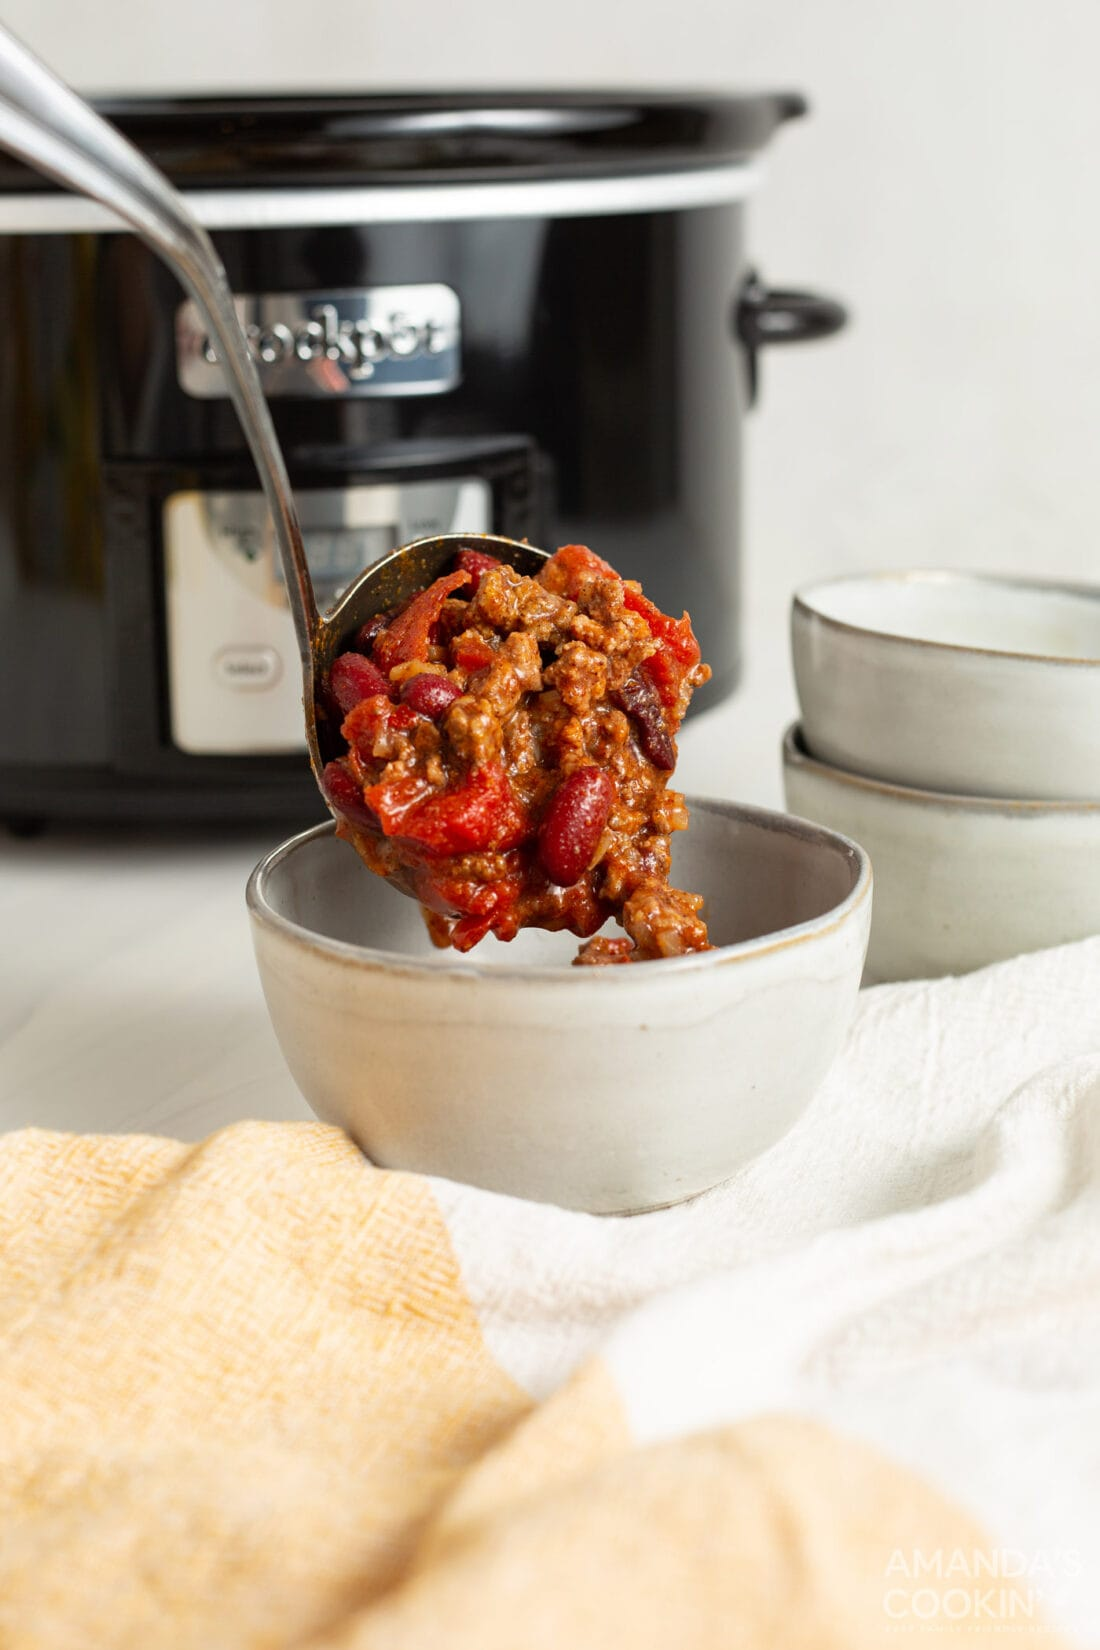 spooning Crockpot Chili into bowl